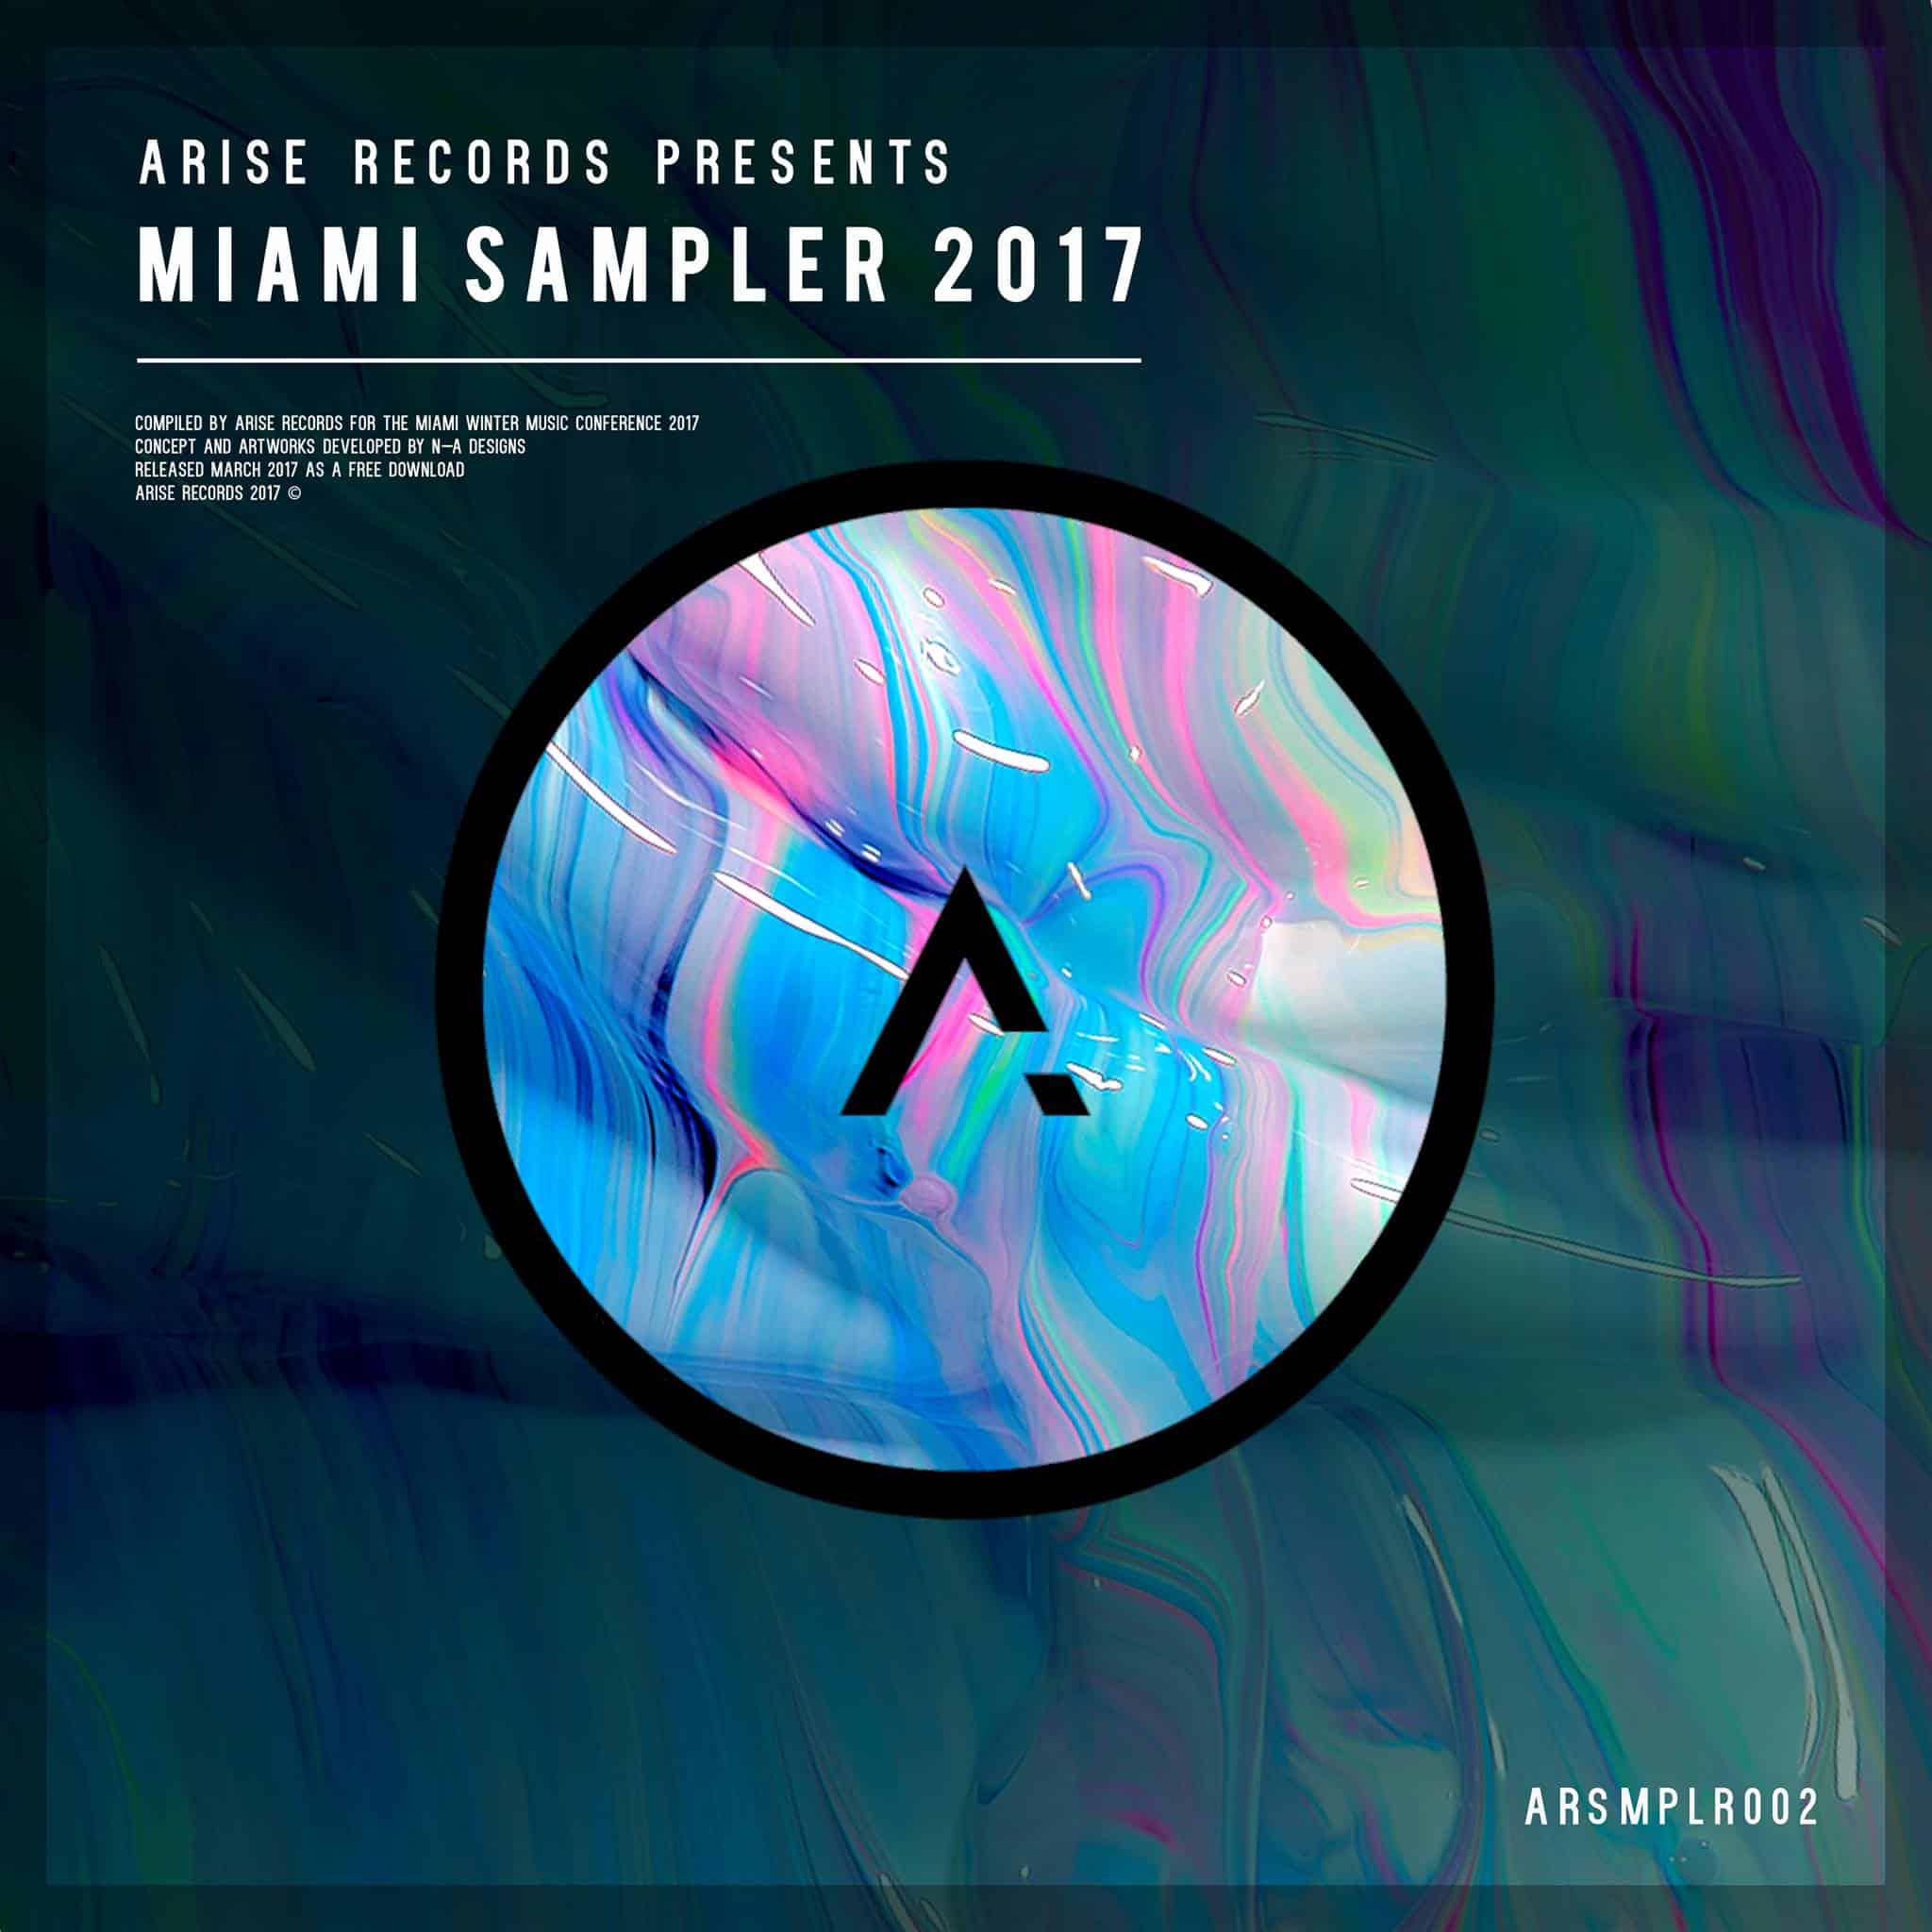 Arise Records Presents Miami Sampler 2017